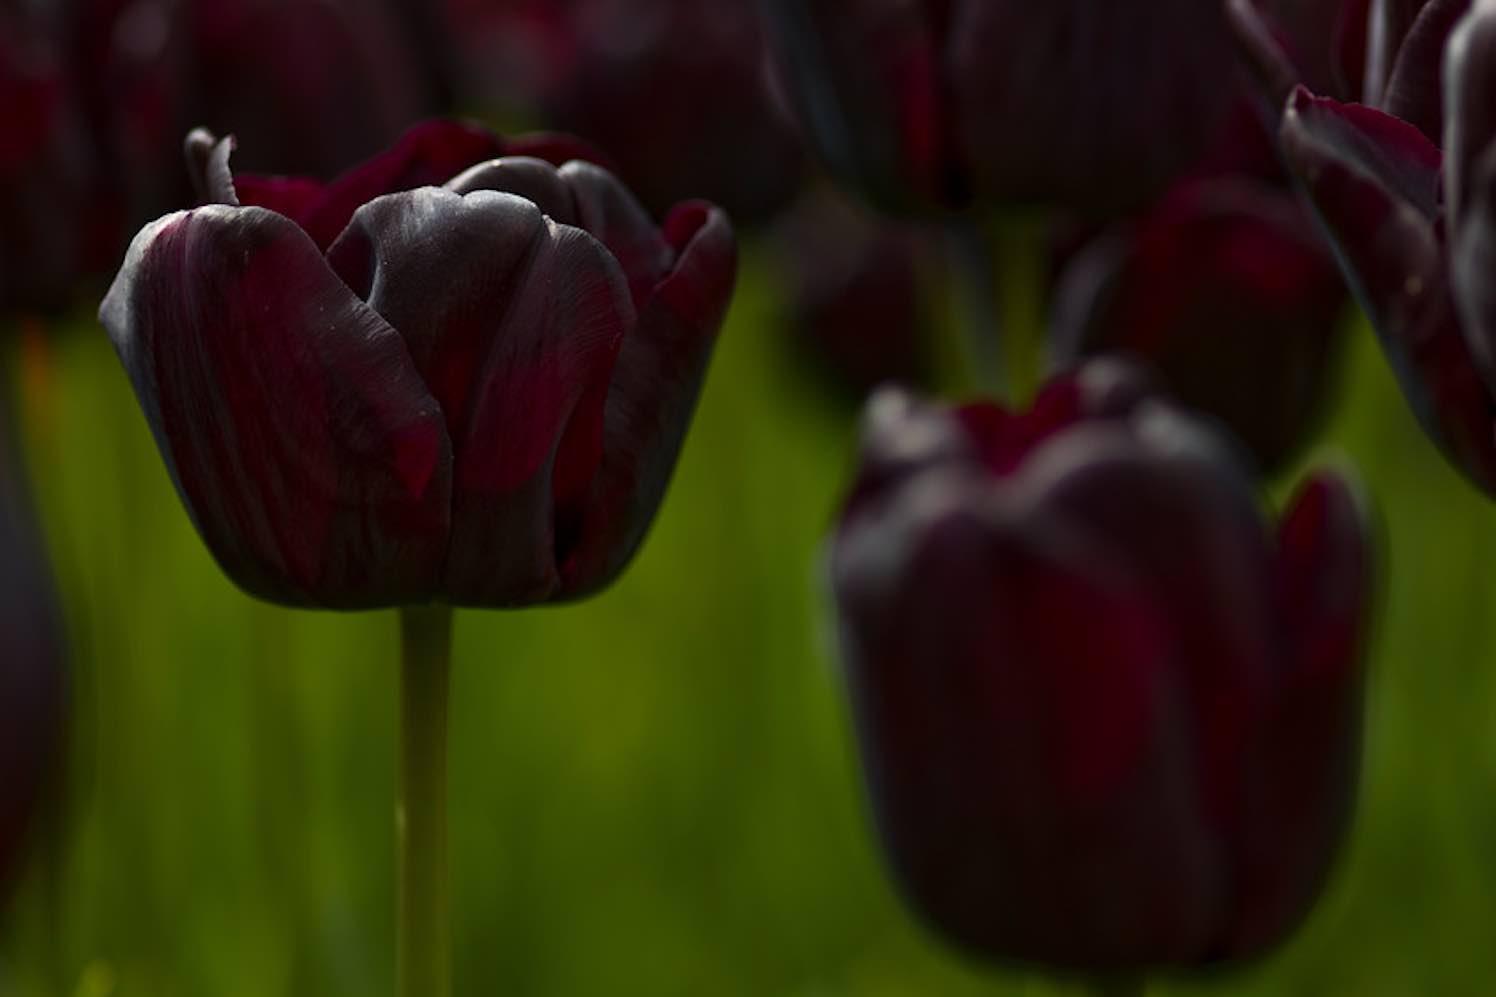 de zwarte tulp